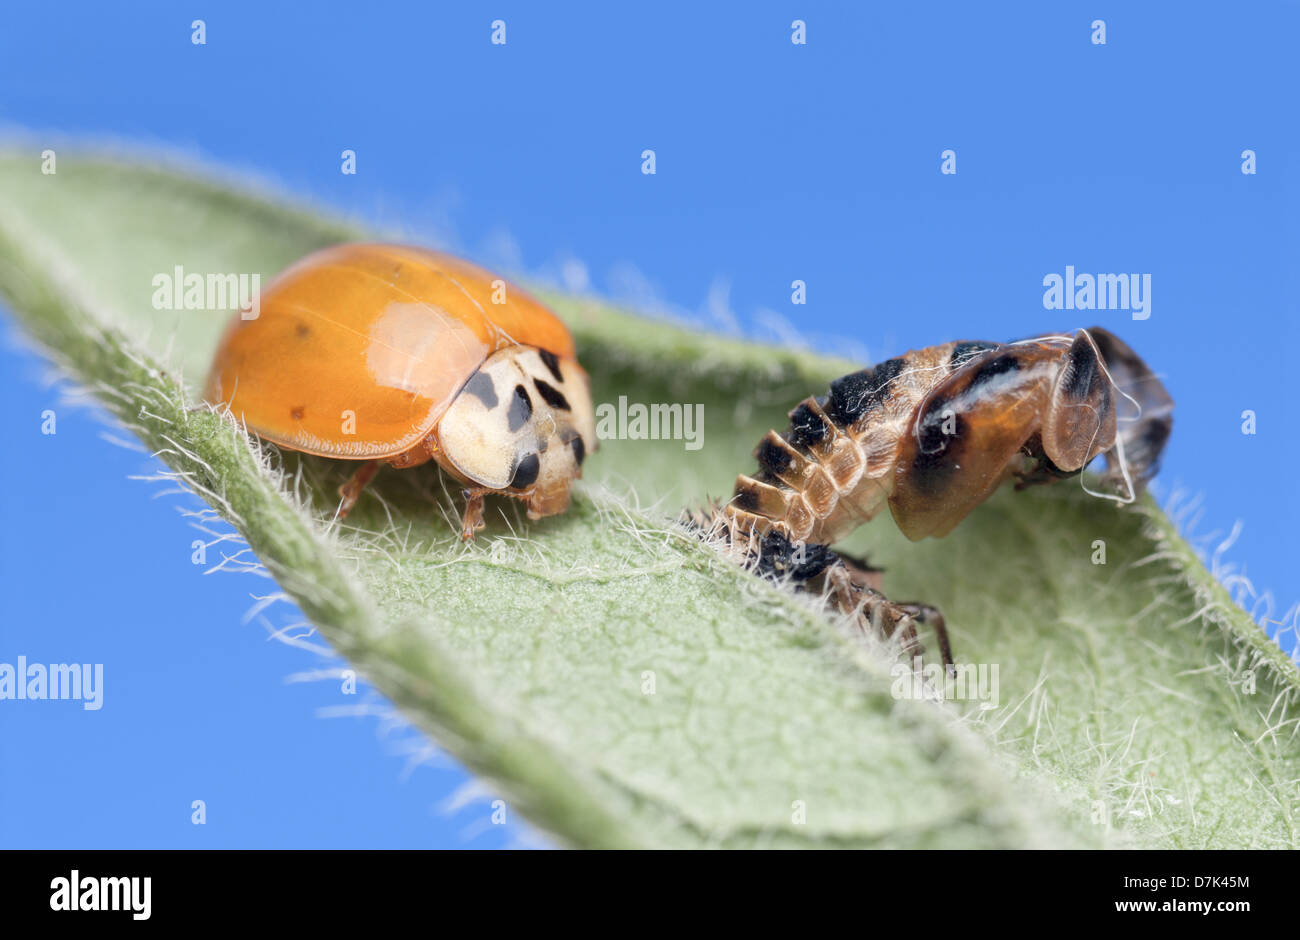 Frisch geschlüpfte Imago (adulte Form) des Harlekin-Marienkäfer Harmonia Axyridis mit pupal Fall Stockbild